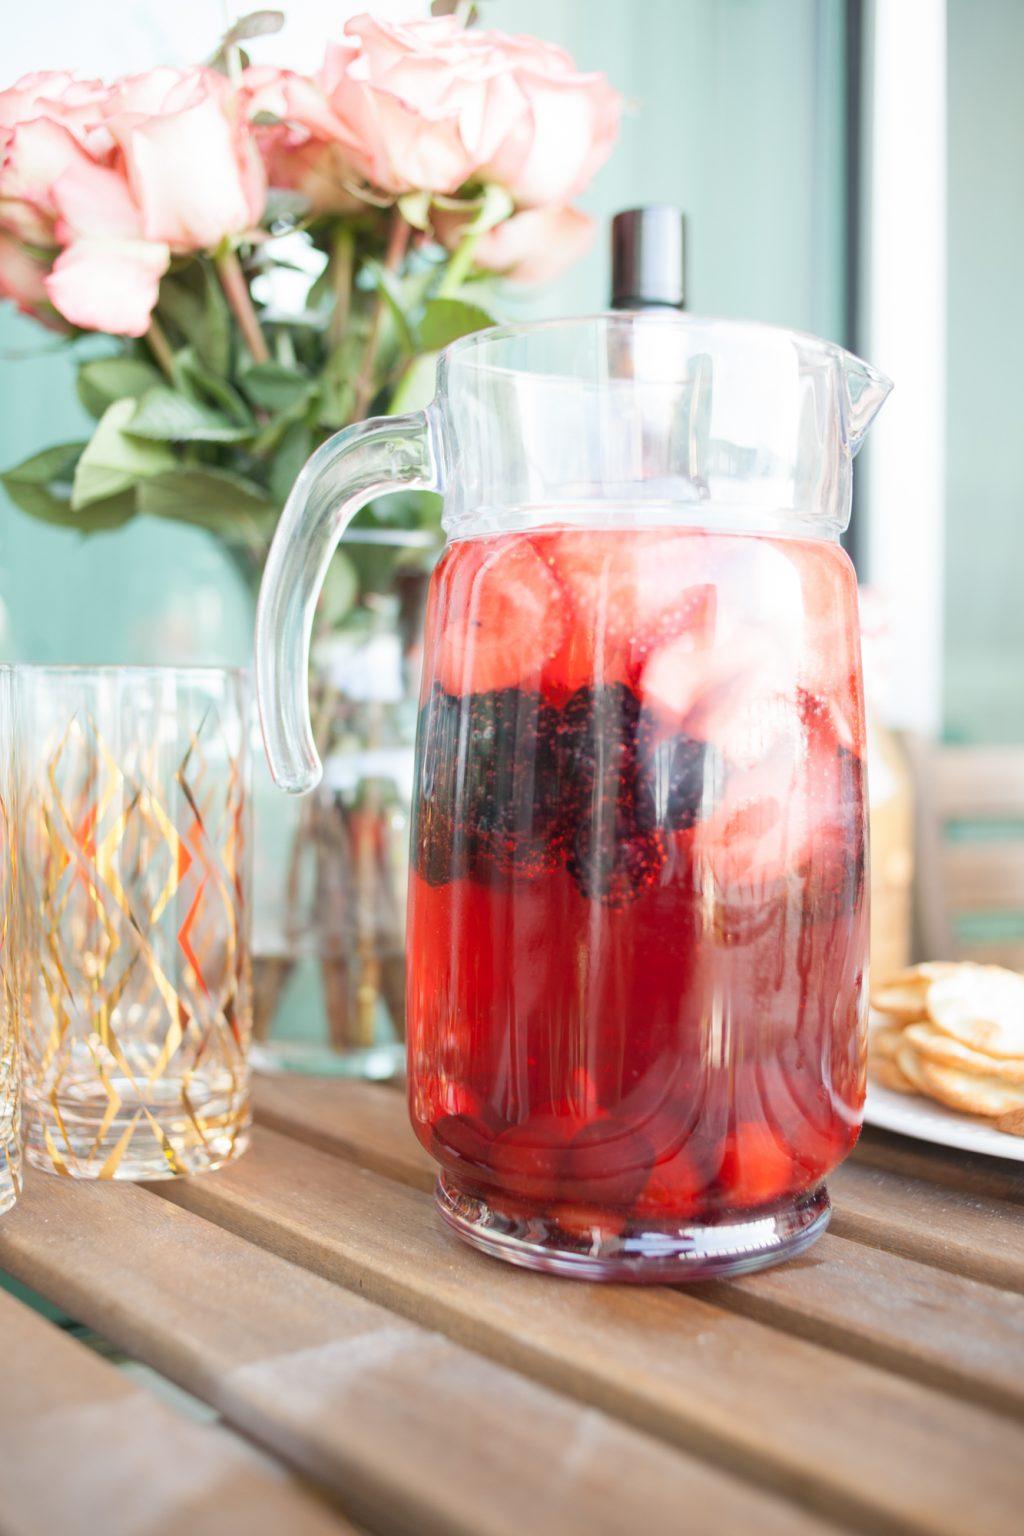 uv sangria vodka, uv vodka, sangria recipe, strawberry lemonade sangria, memorial day celebration, summer soiree party